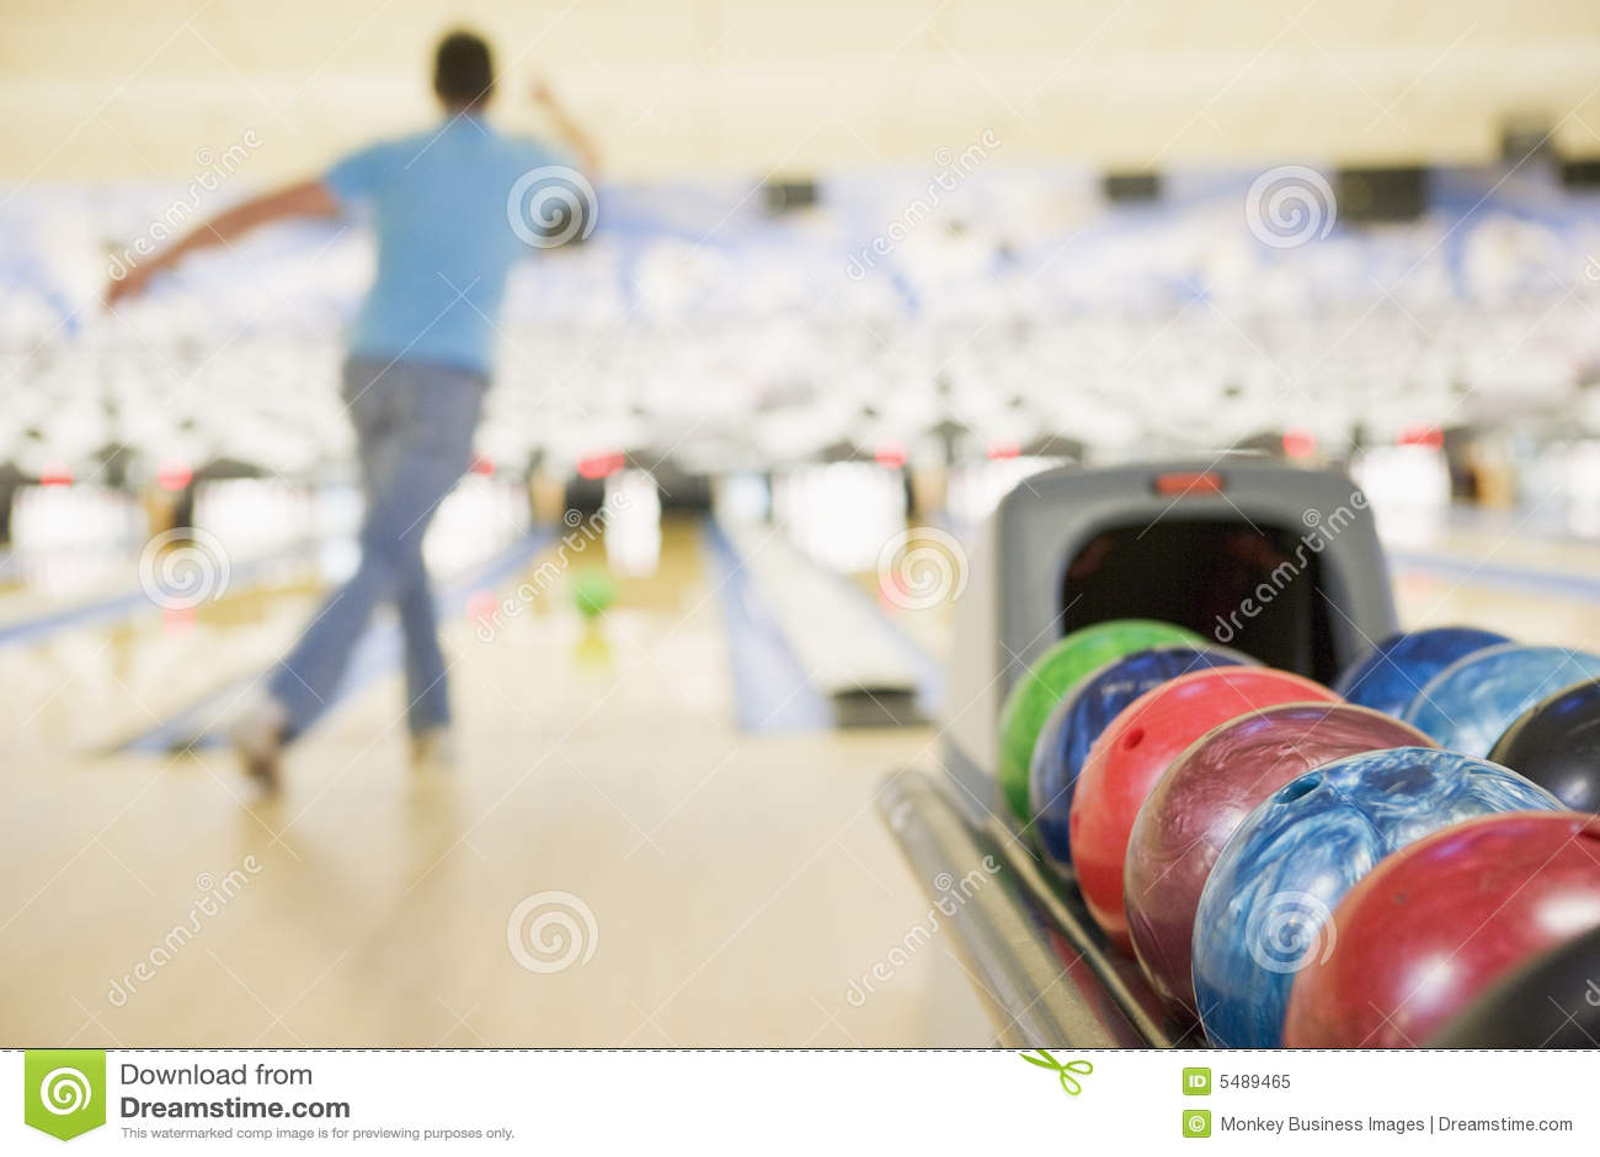 Bowling ball machine with man bowling